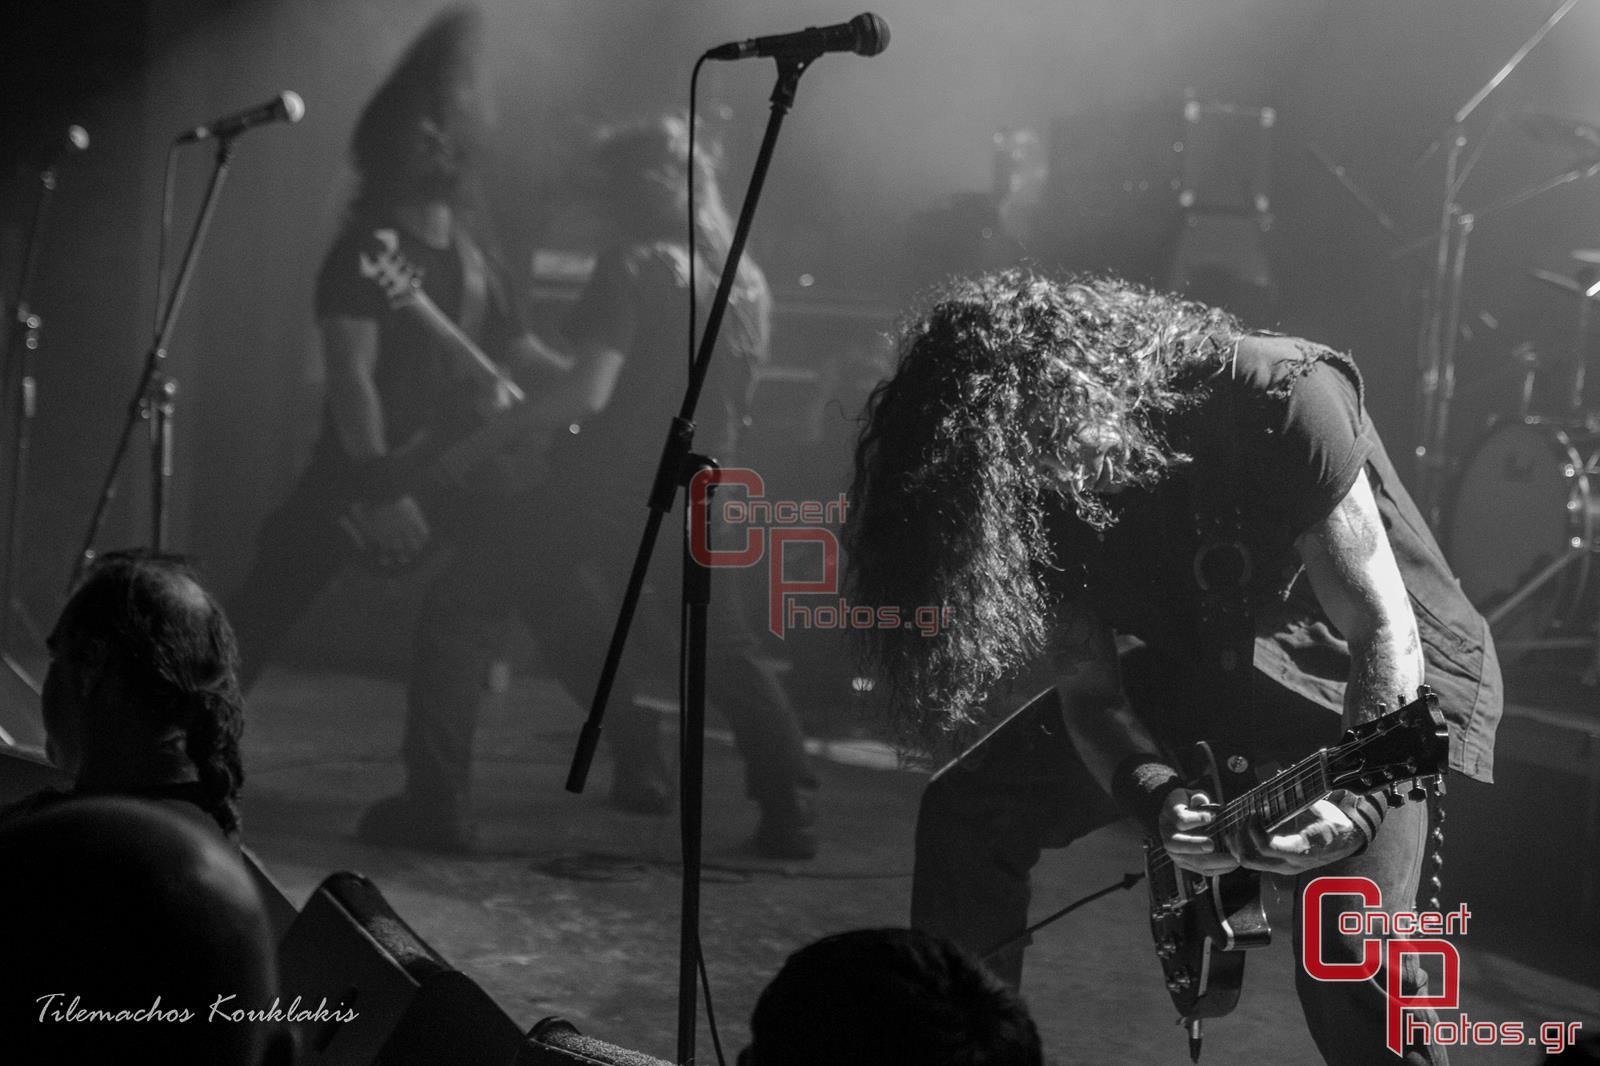 Rotting Christ-Rotting Christ photographer:  - ConcertPhotos-5638